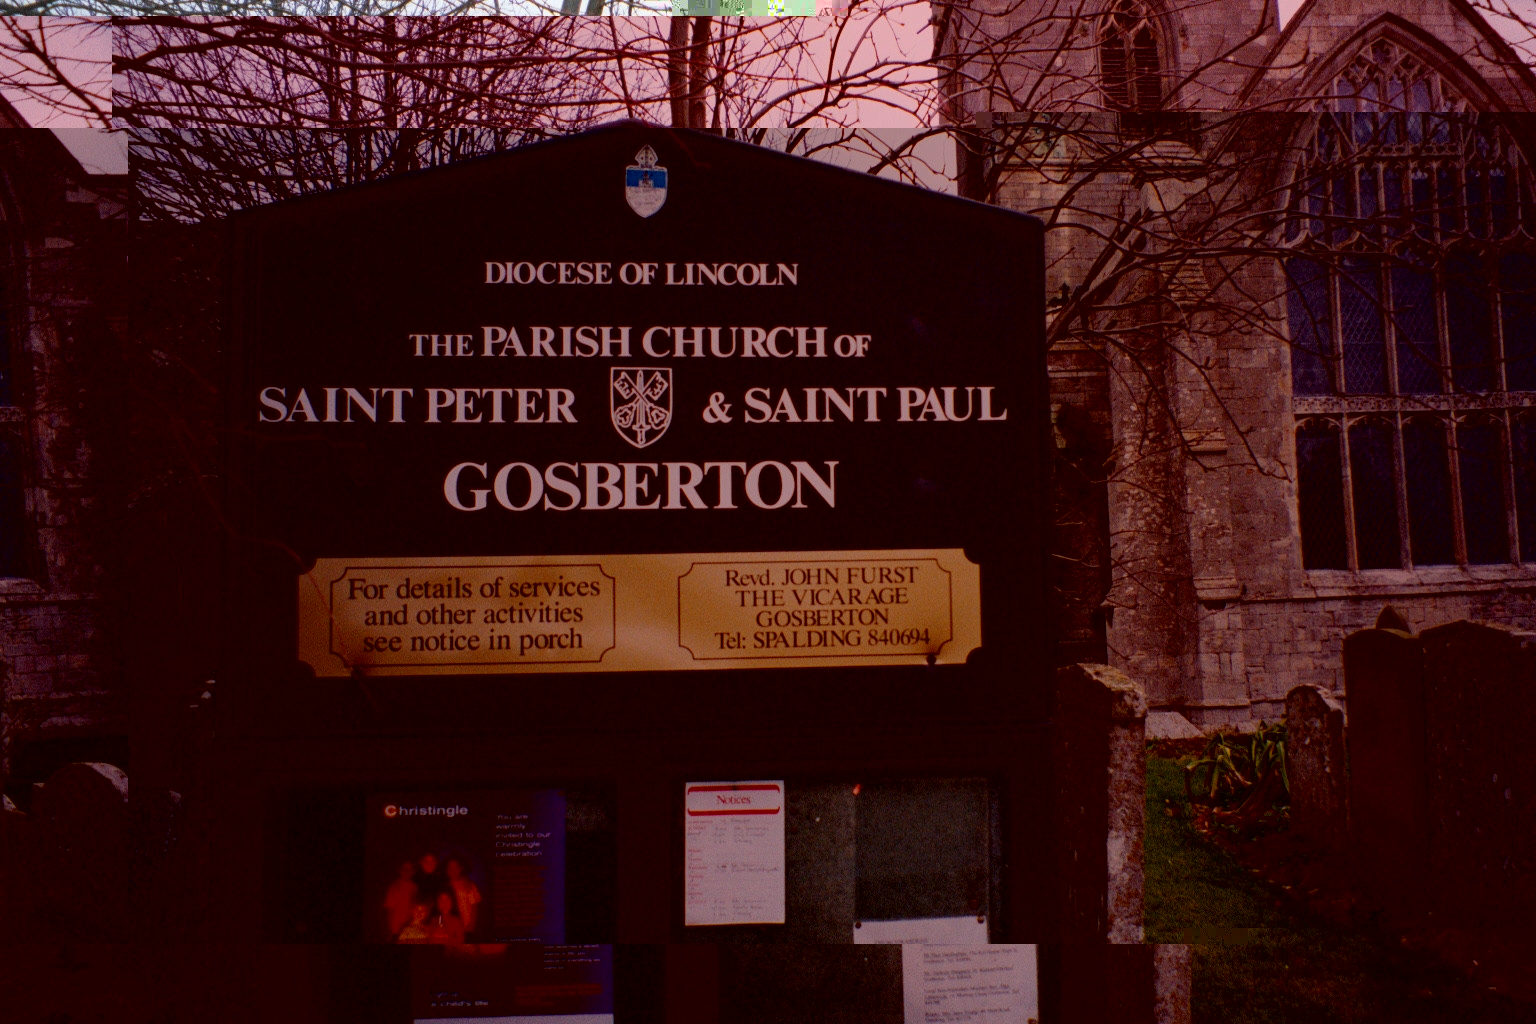 Gosberton church sign